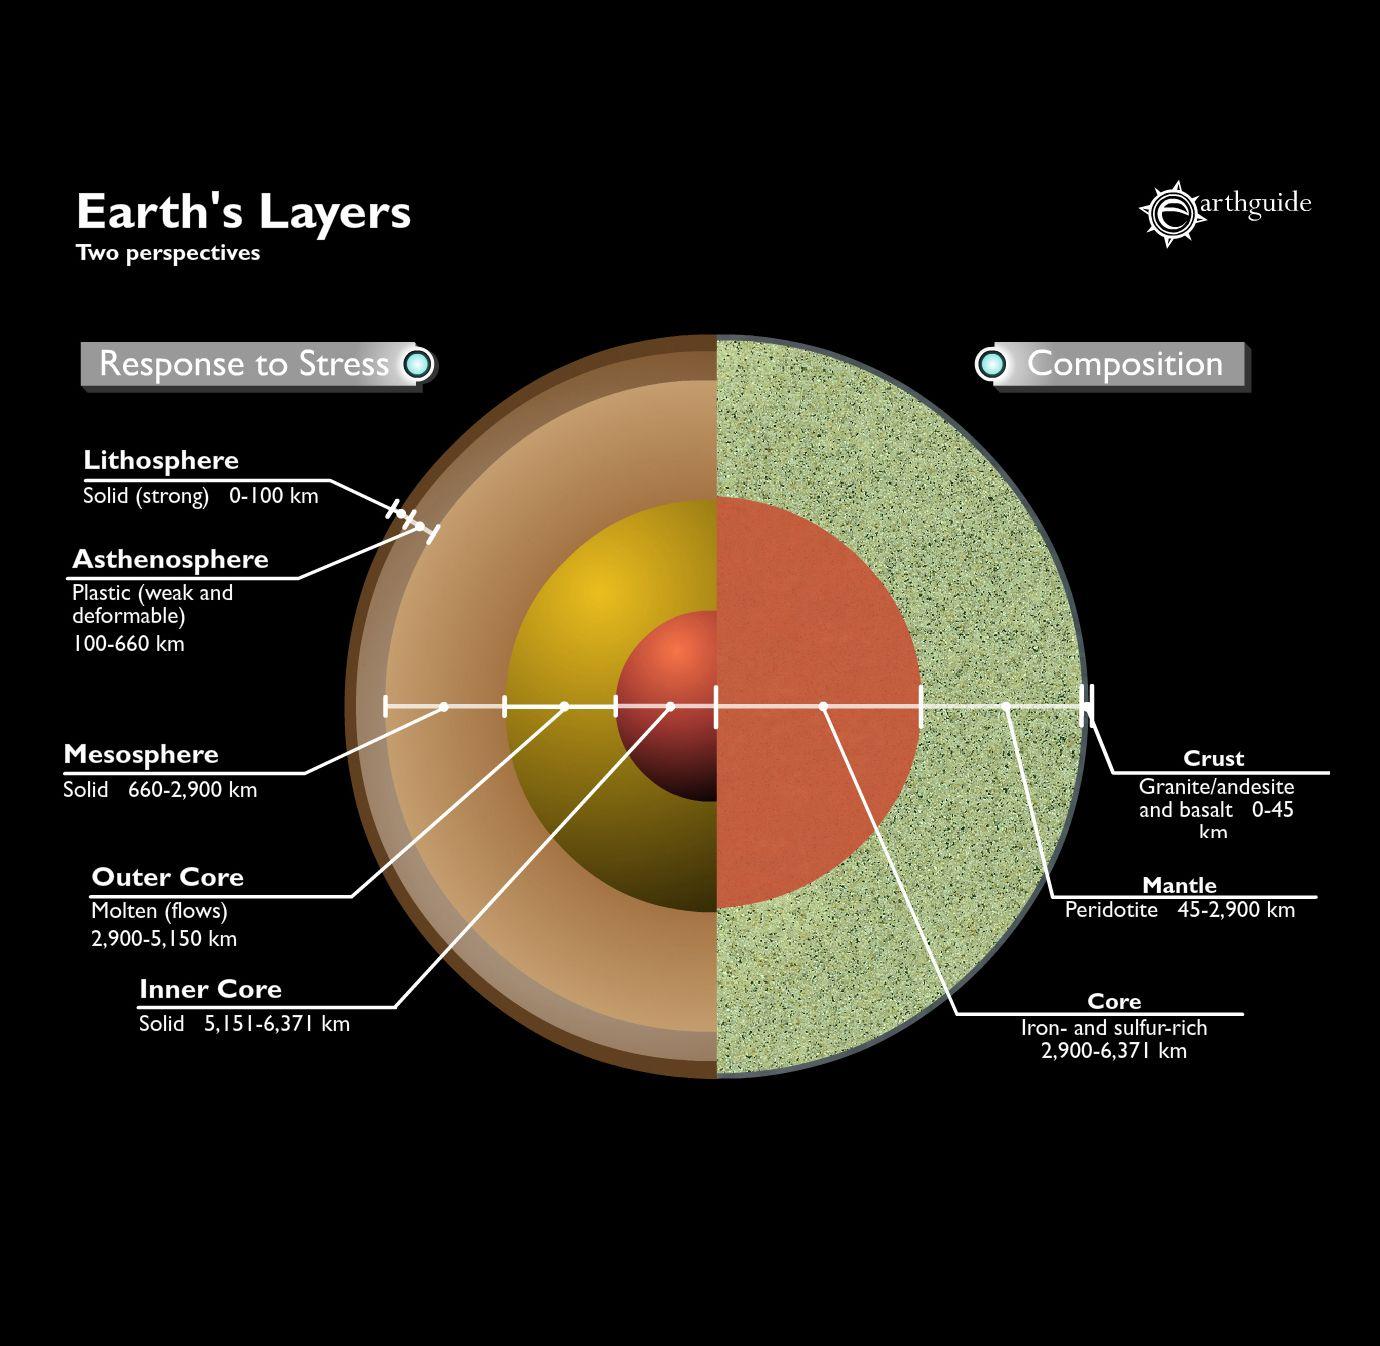 Mechanical Layers Of Earth